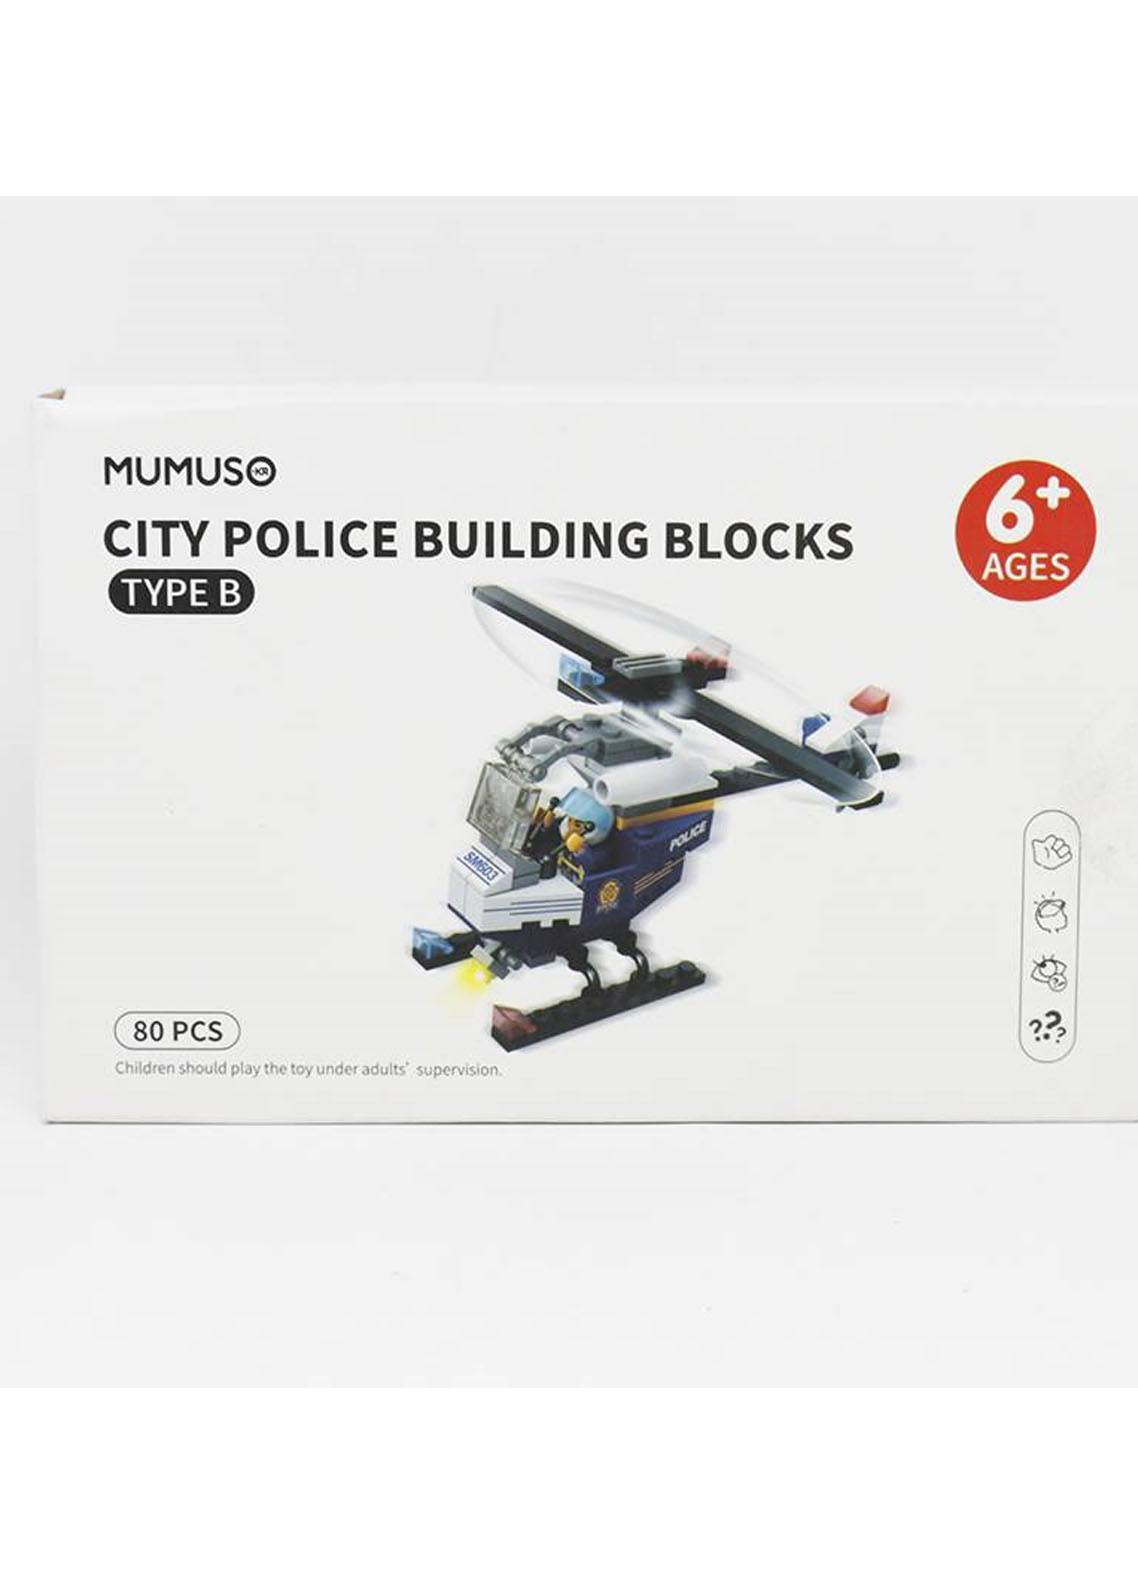 Mumuso City Police Building Blocks-Type A